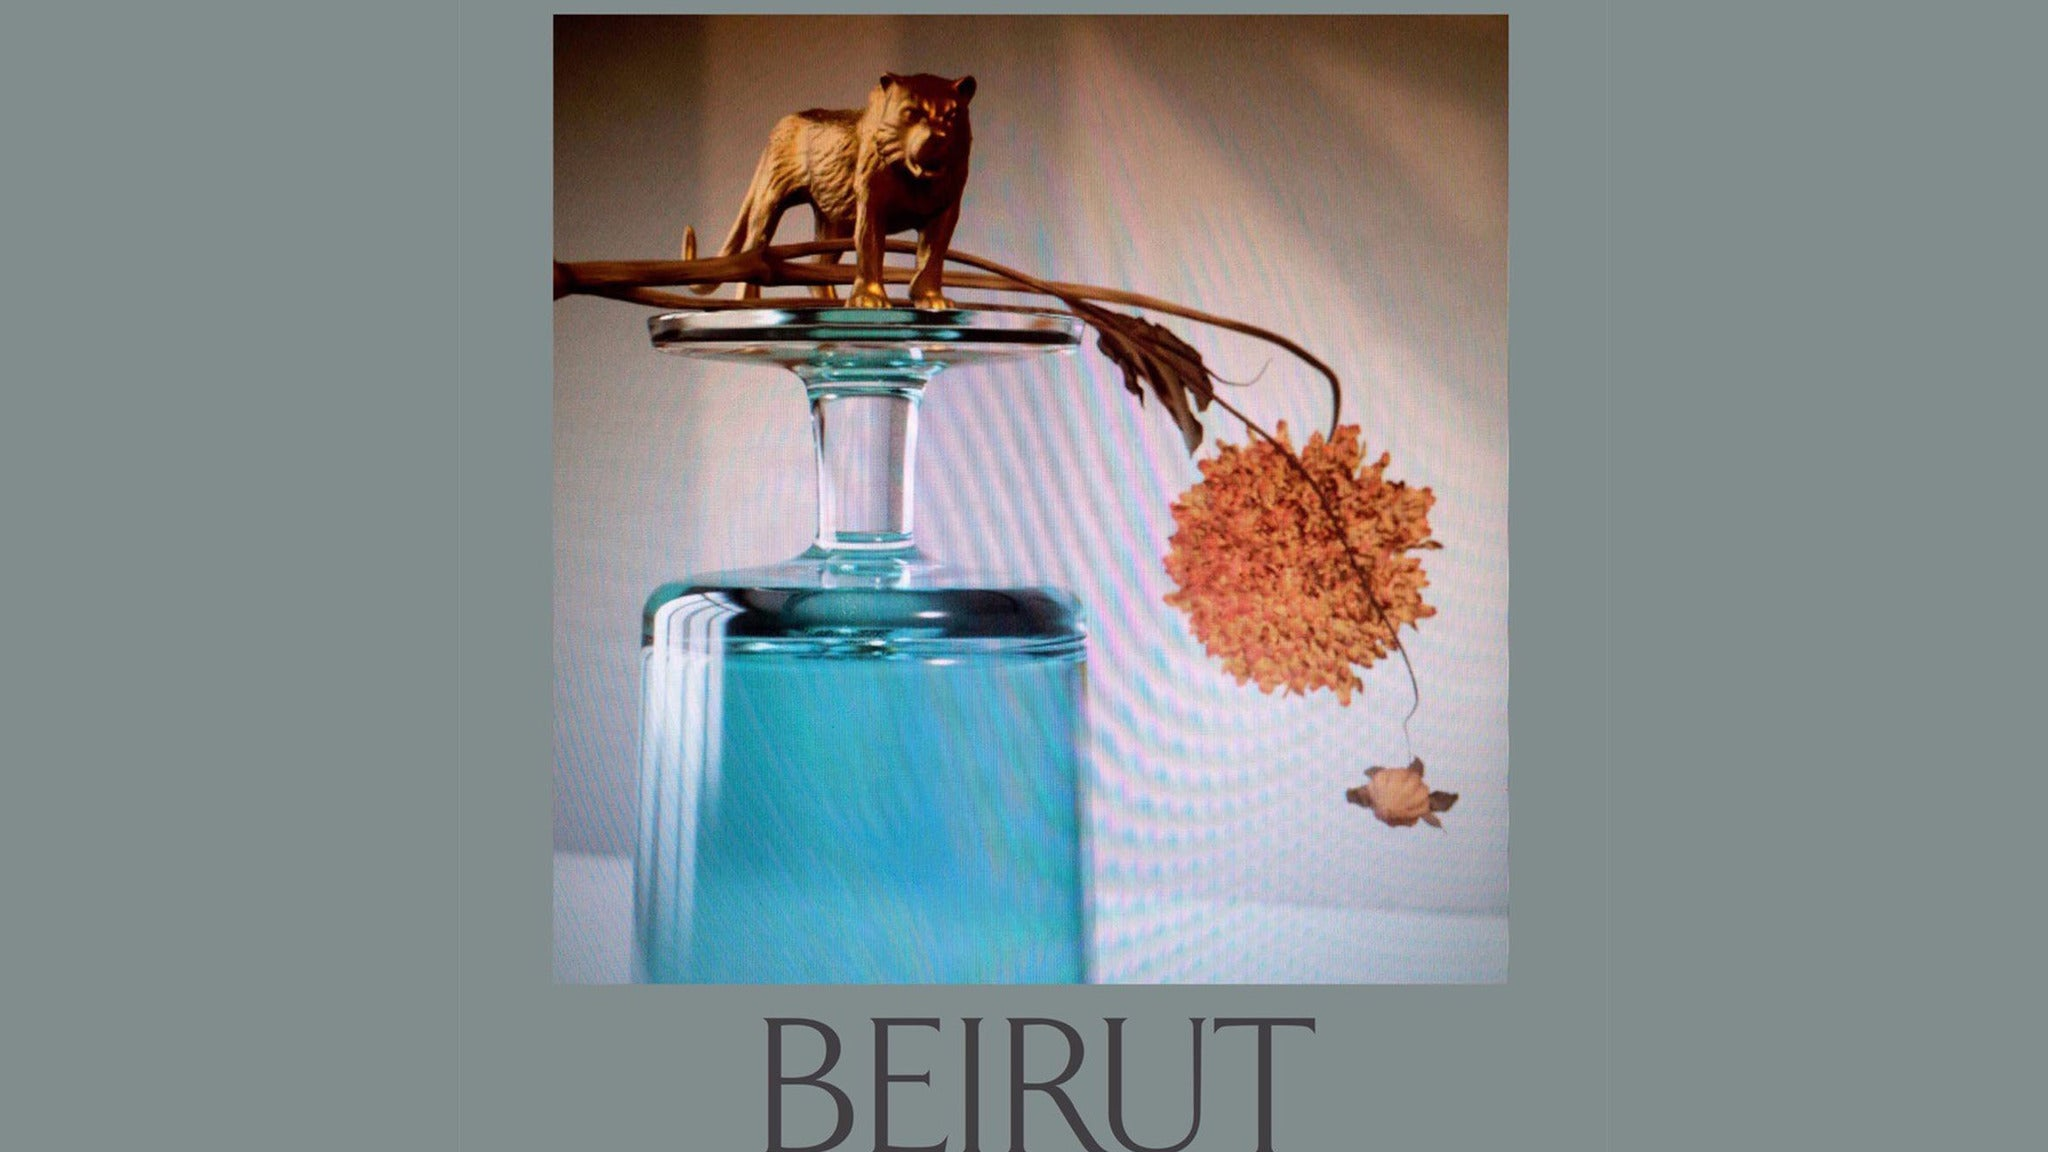 Beirut at Fox Theater - Oakland